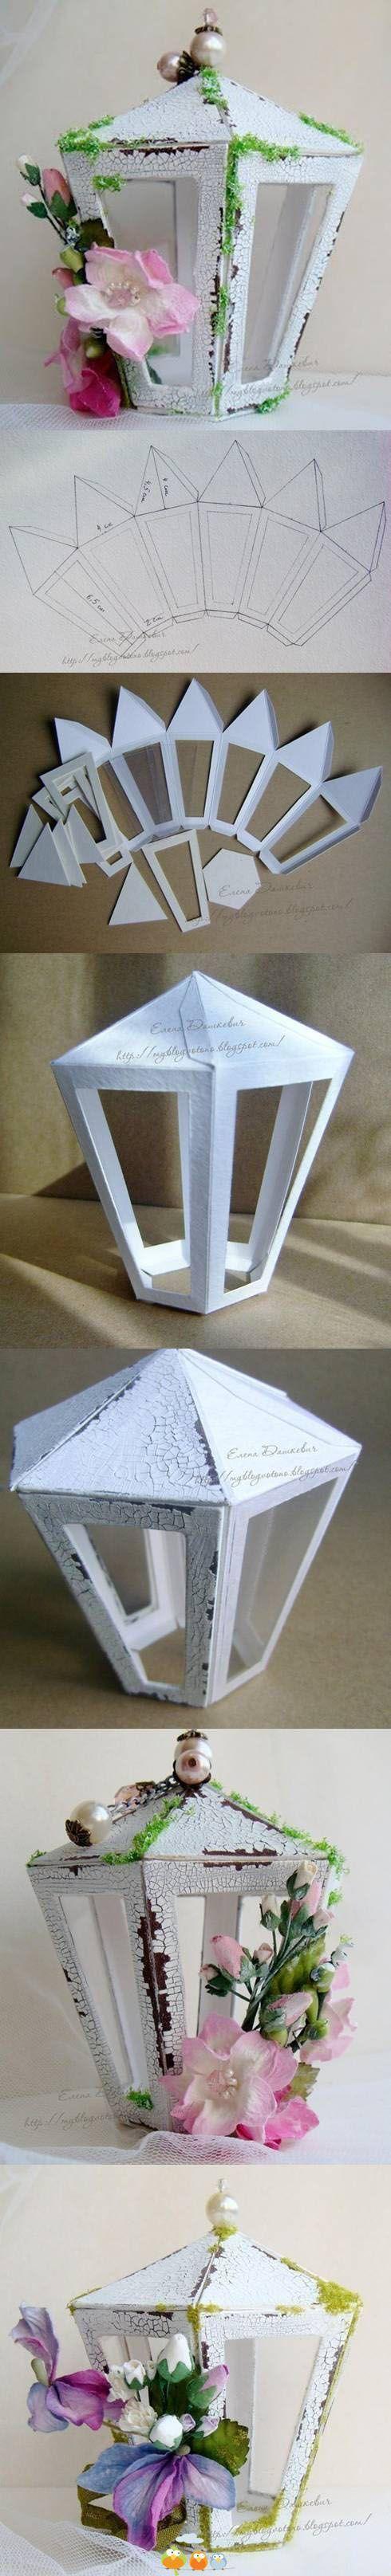 DIY Indoor Laterne aus Papier